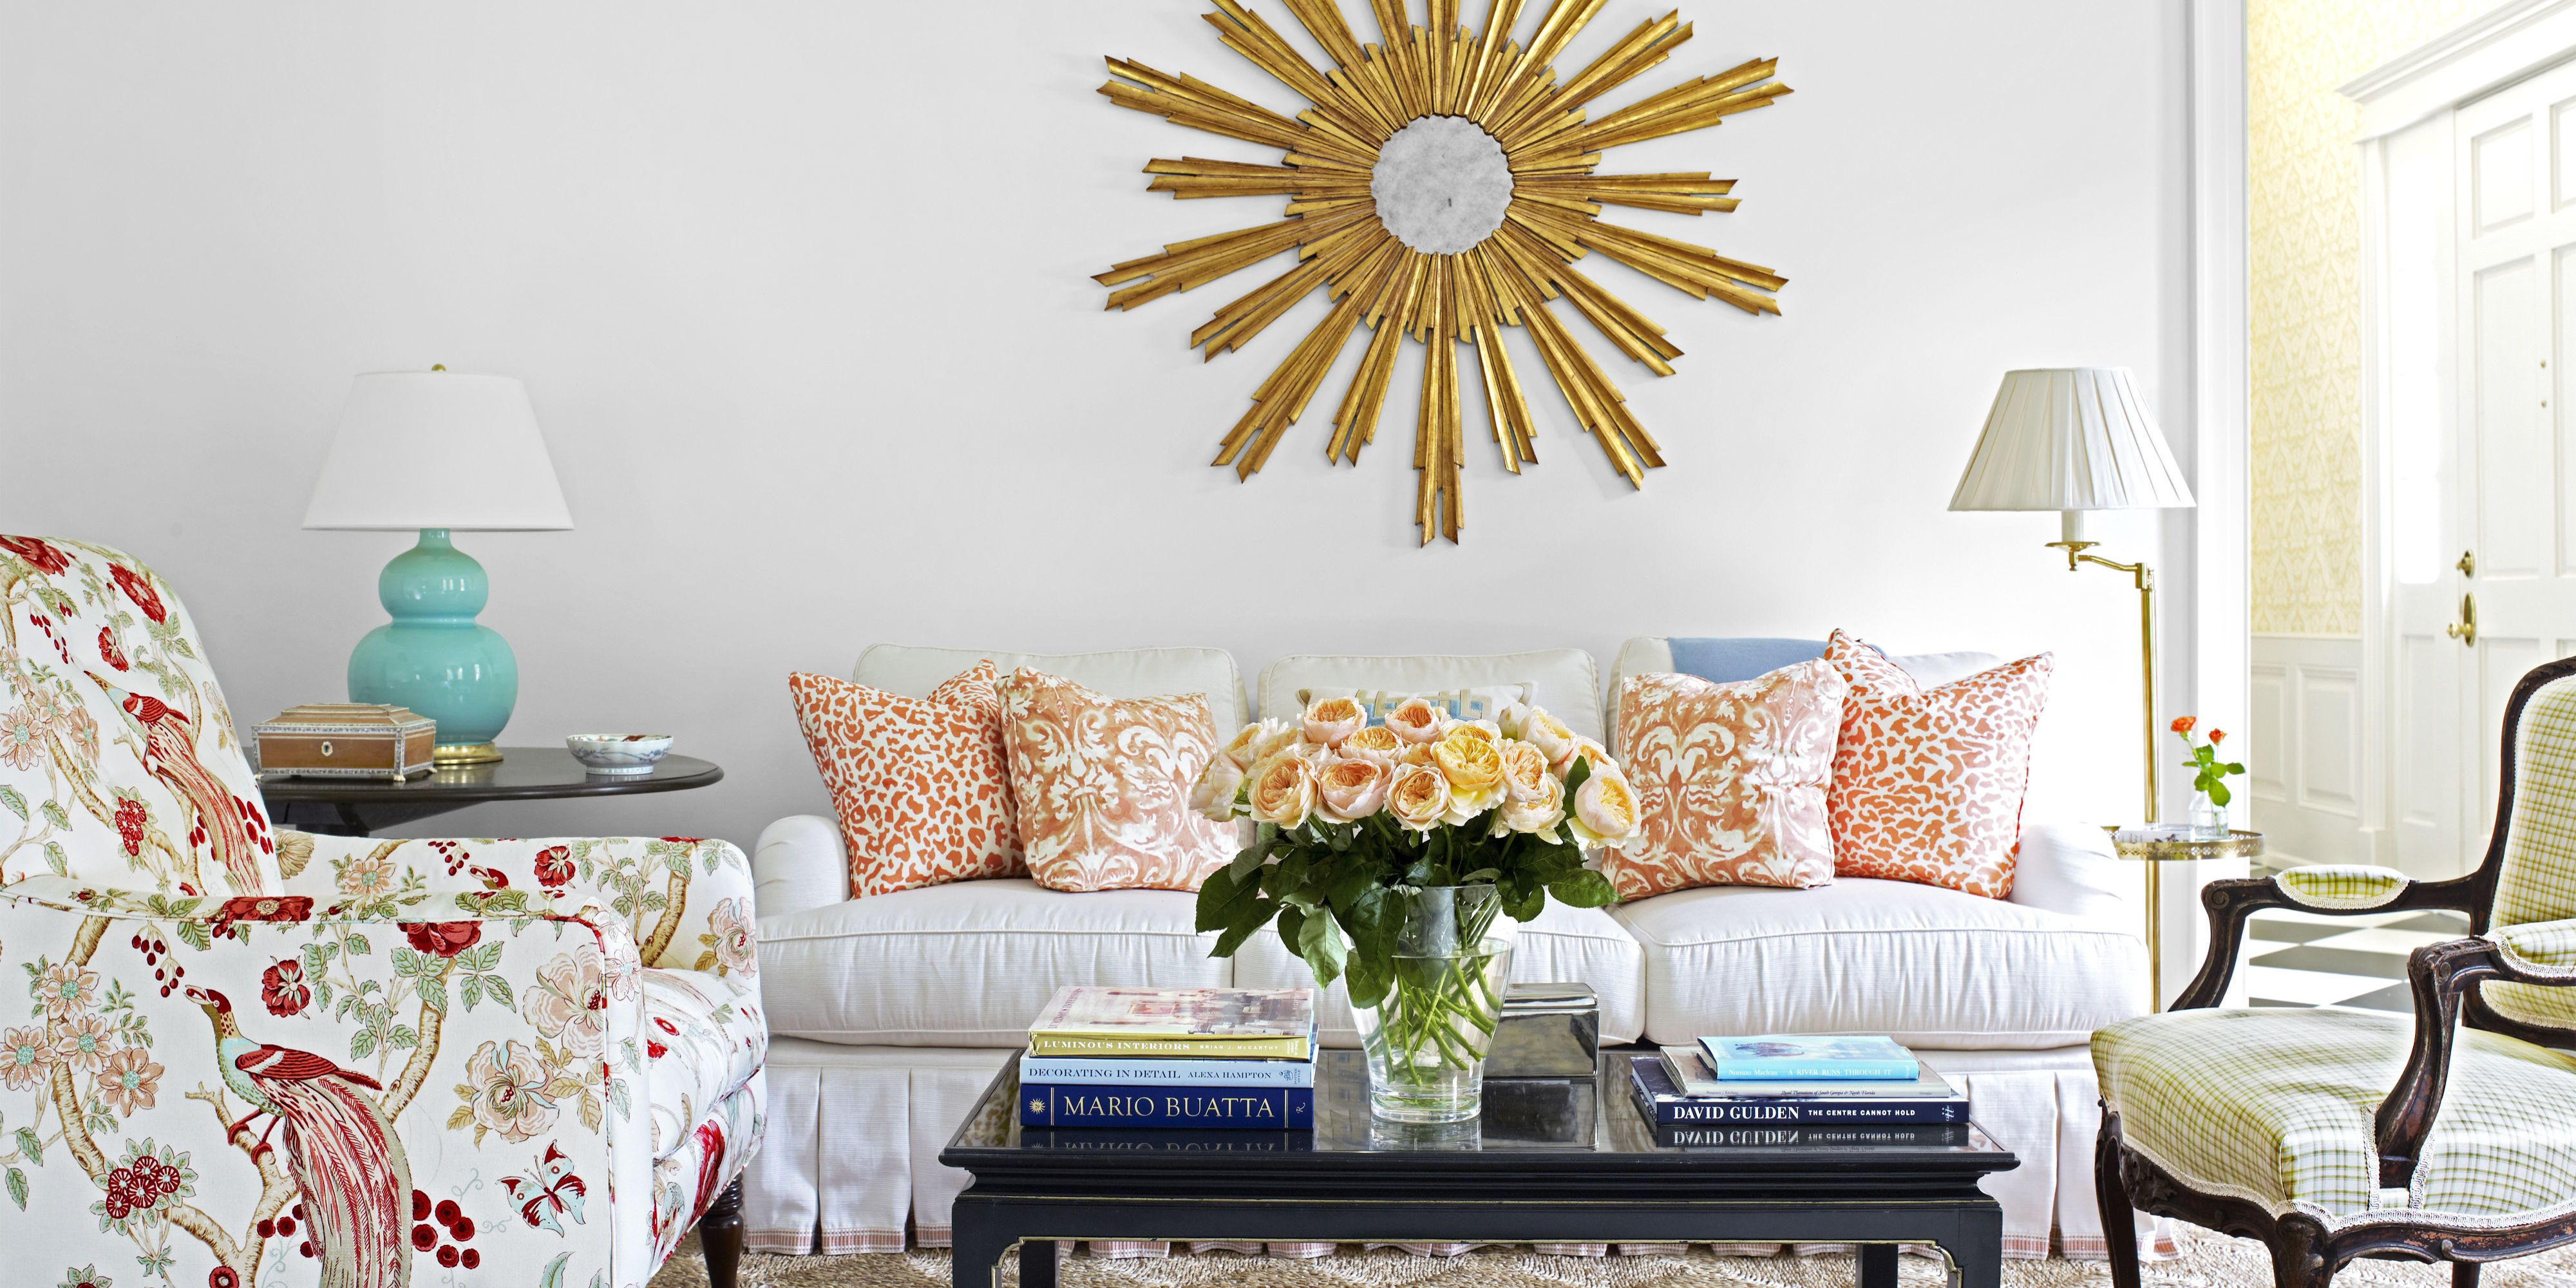 22 best interior decorating secrets decorating tips and tricks rh housebeautiful com interior design tips for mixing woods interior design tips bedroom